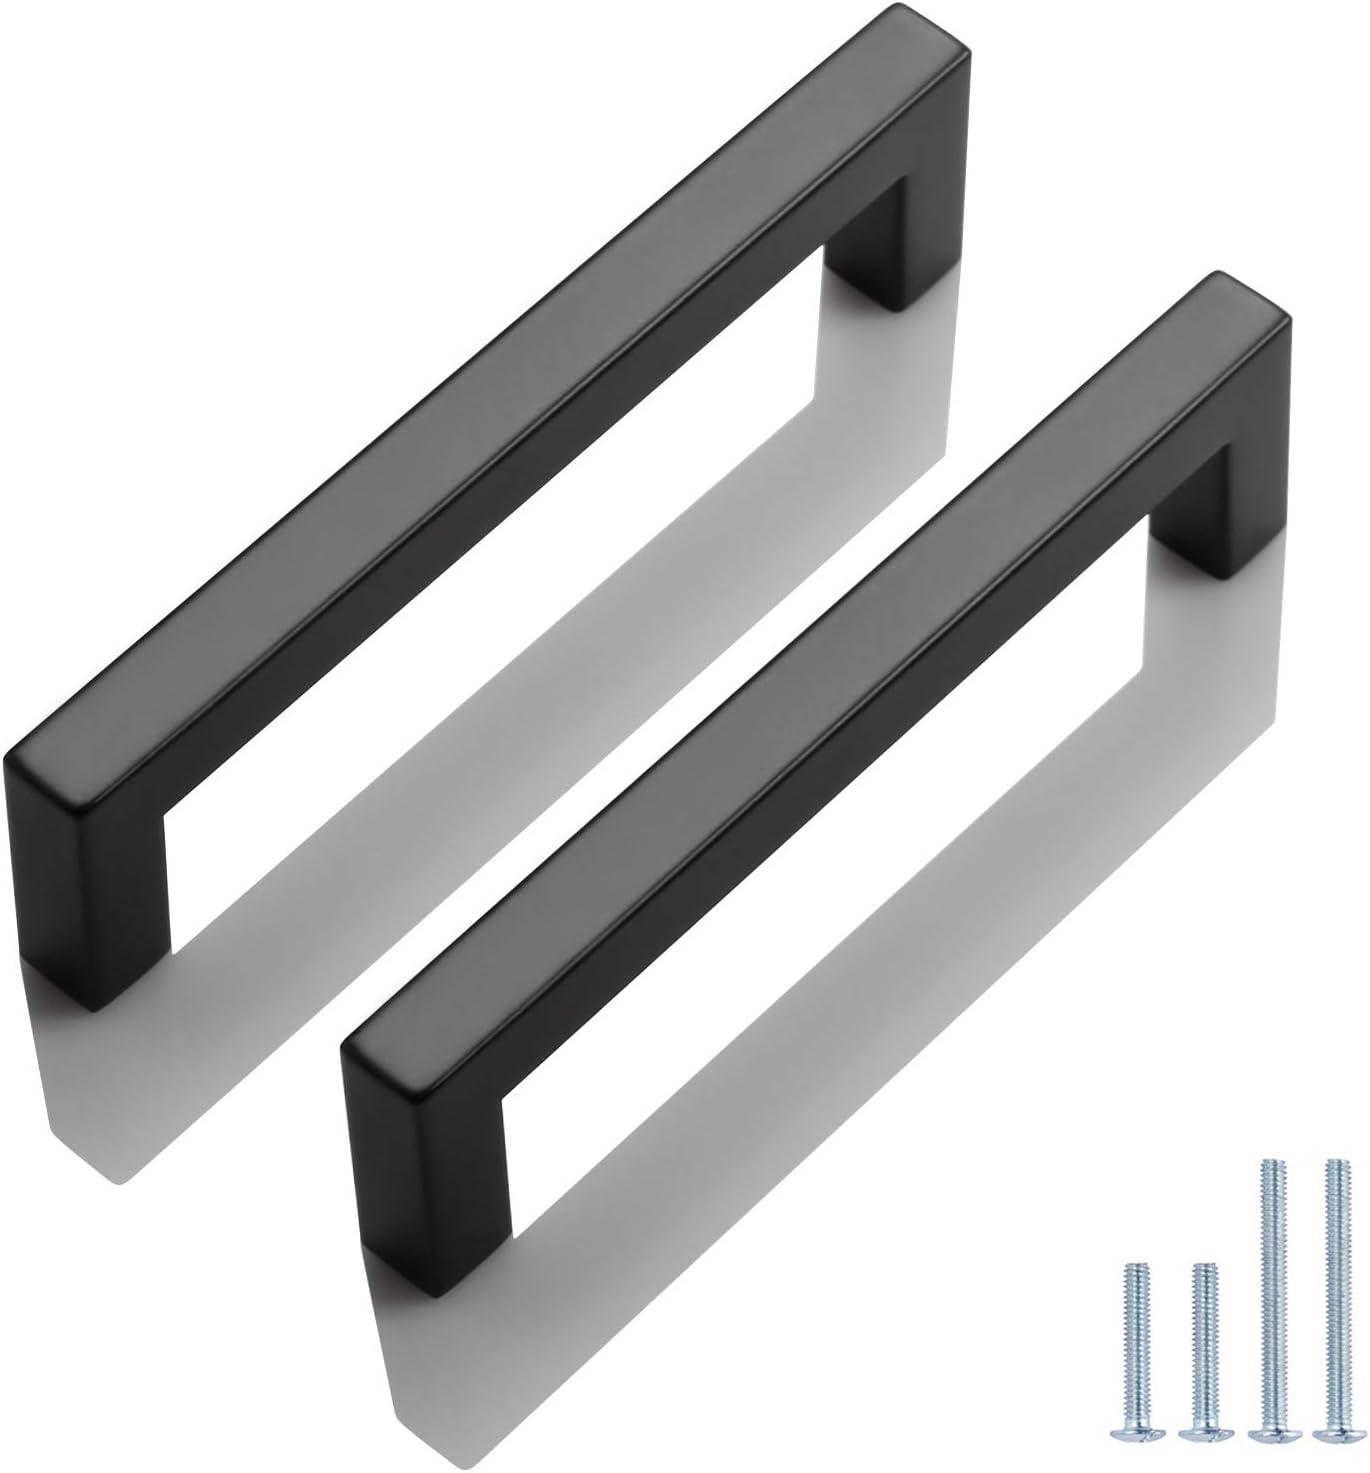 30 Pack Probrico Black Cabinet Pulls Square Kitchen Cabinet Hardware 5 Inch 128mm Hole Center Modern Drawer Handles Stainless Steel Matte Black Drawer Pulls For Cupboard Amazon Com